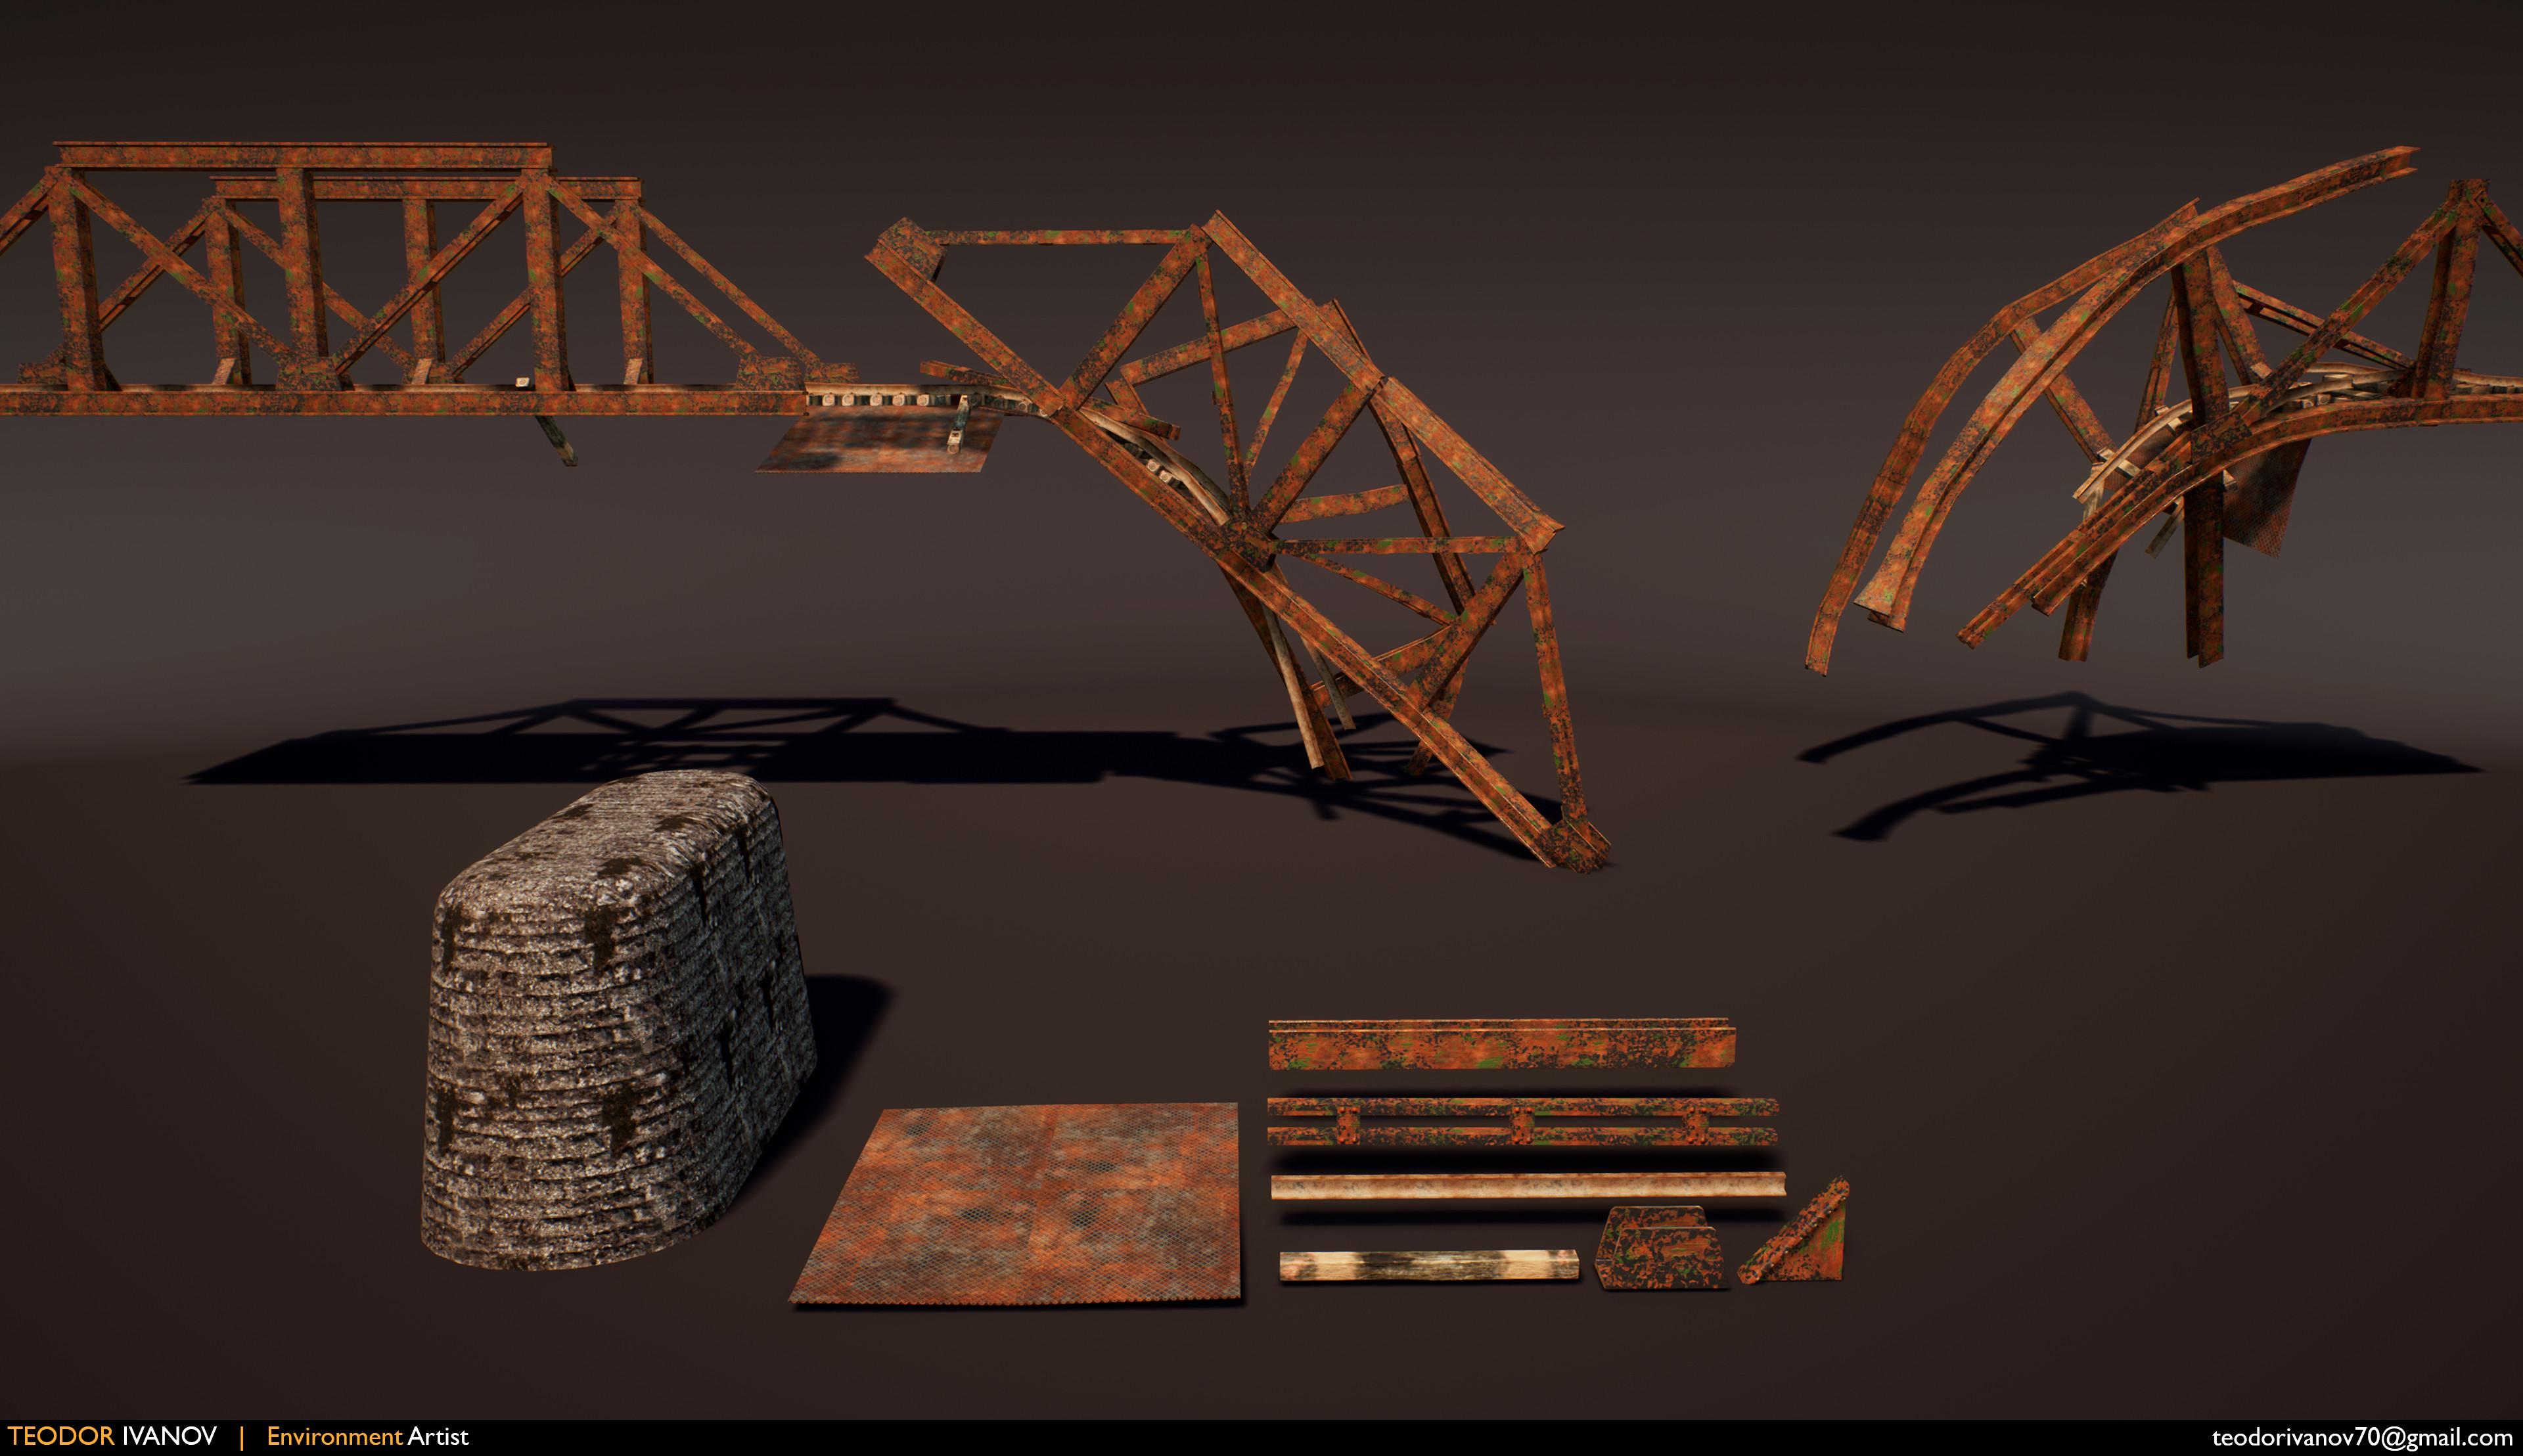 Modular pieces used to create the bridge and train tracks.